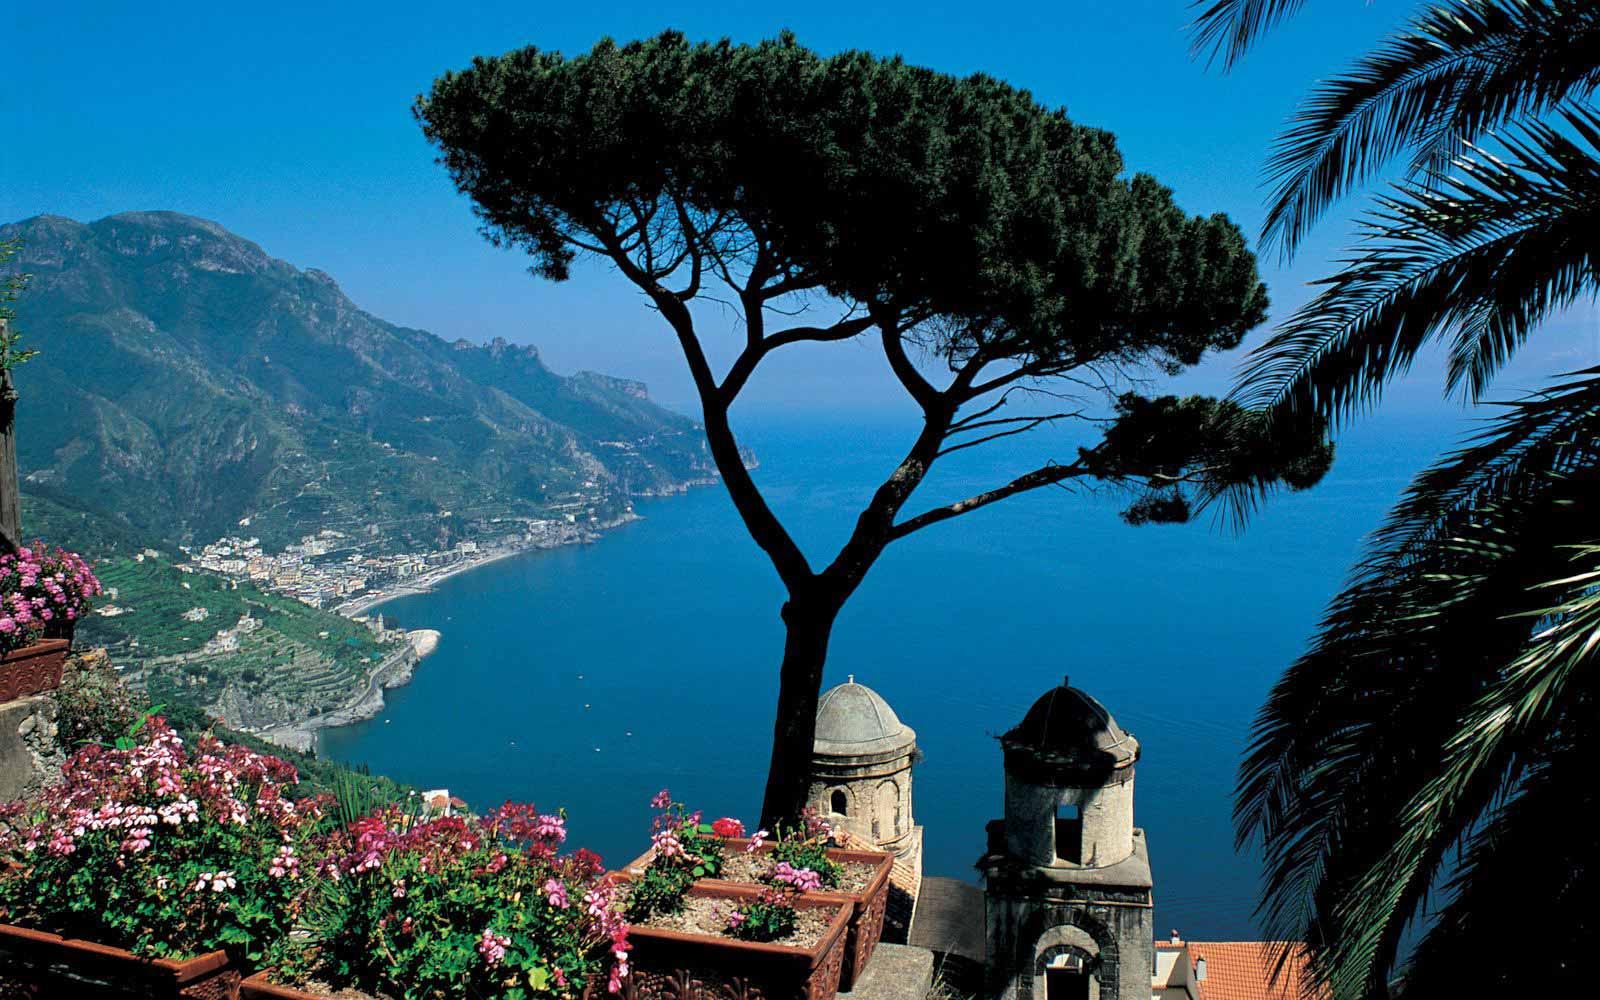 View over Capo D'Orso from Belmond Hotel Caruso